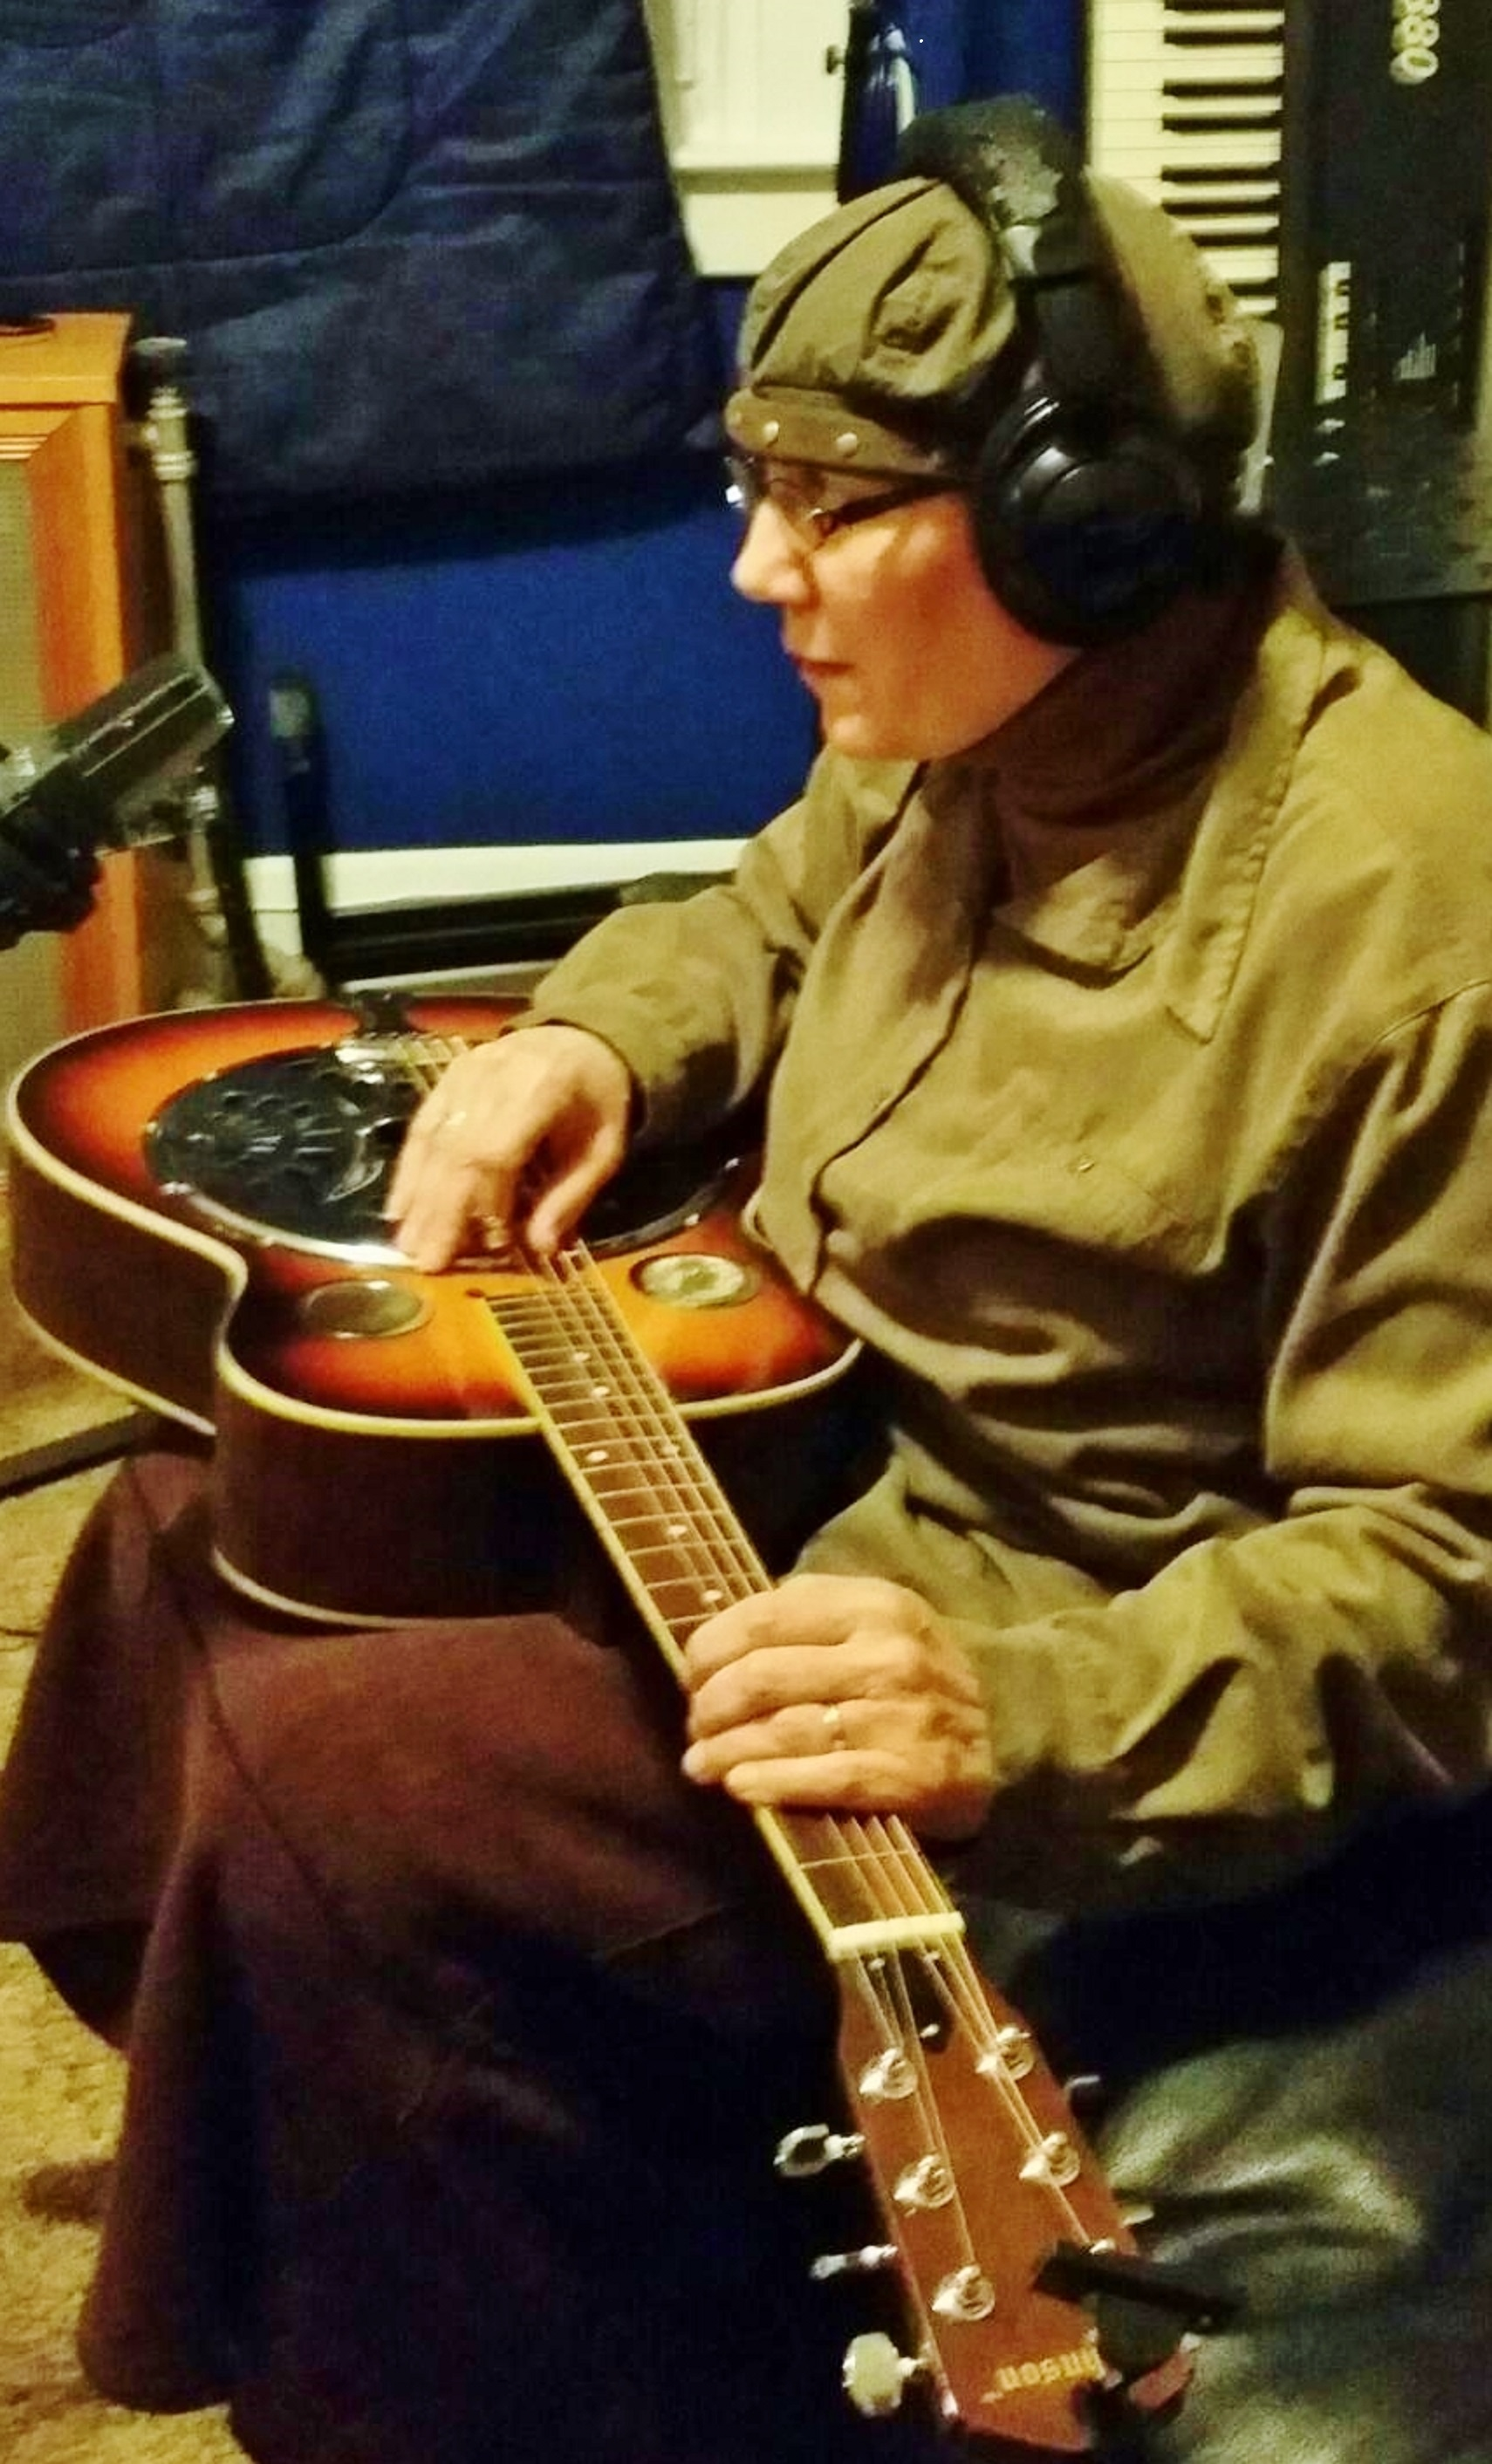 Shalomis on slide guitar